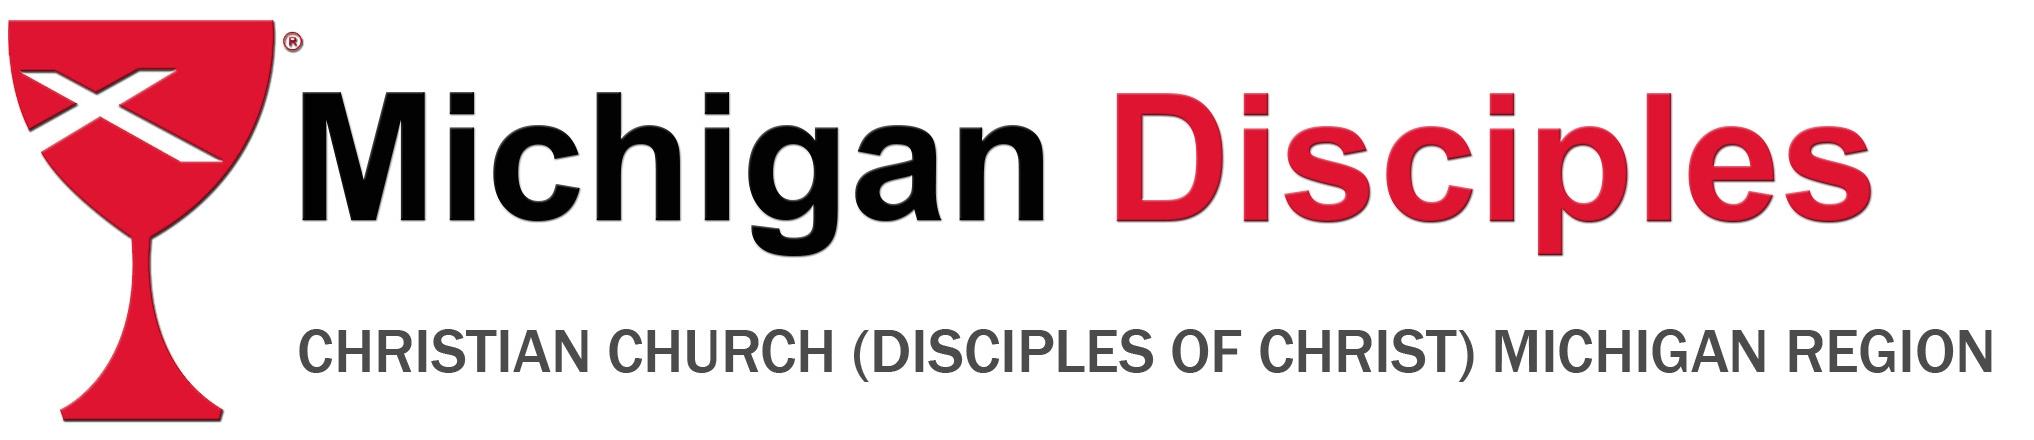 Michigan Disciples Logo 2017-05.jpg